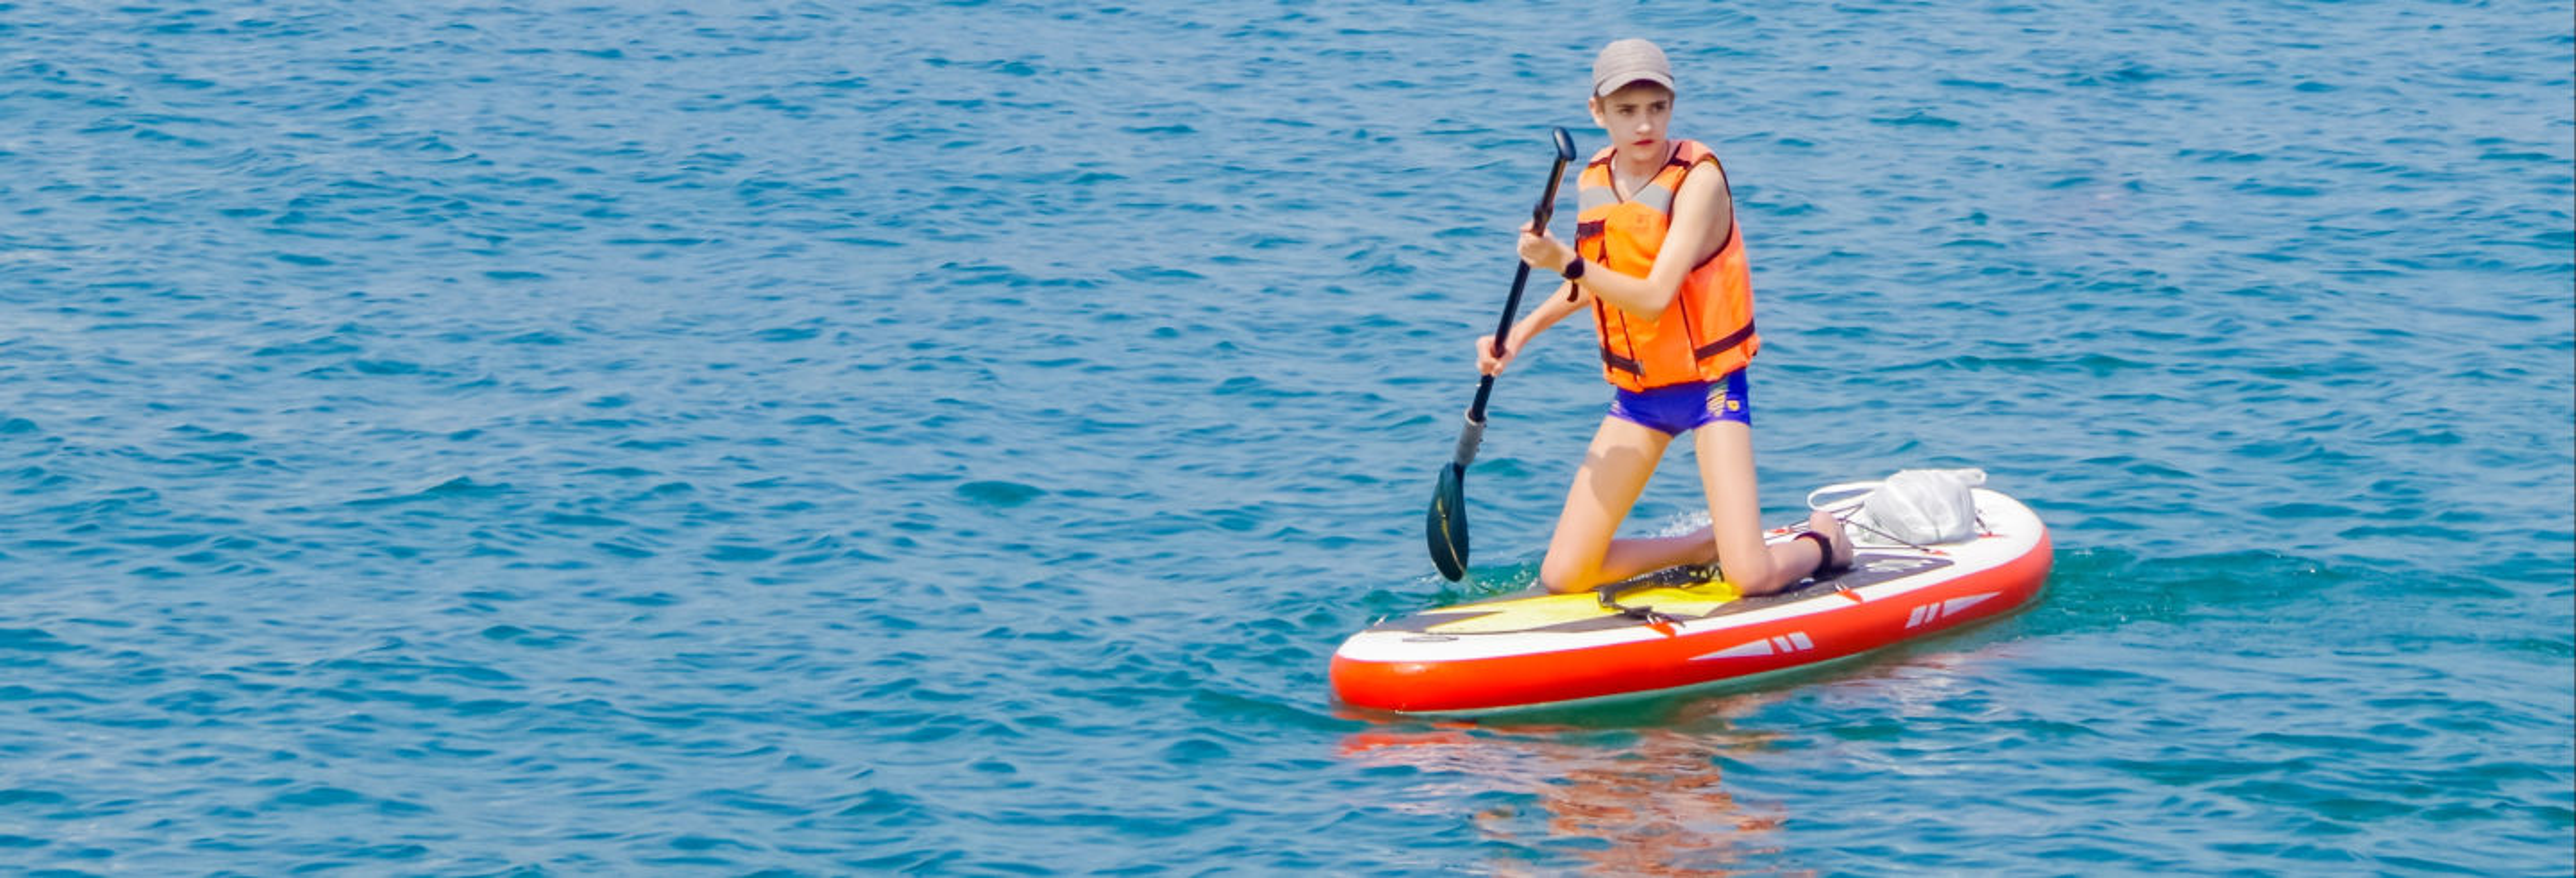 Curso de paddle surf en la laguna Silvia